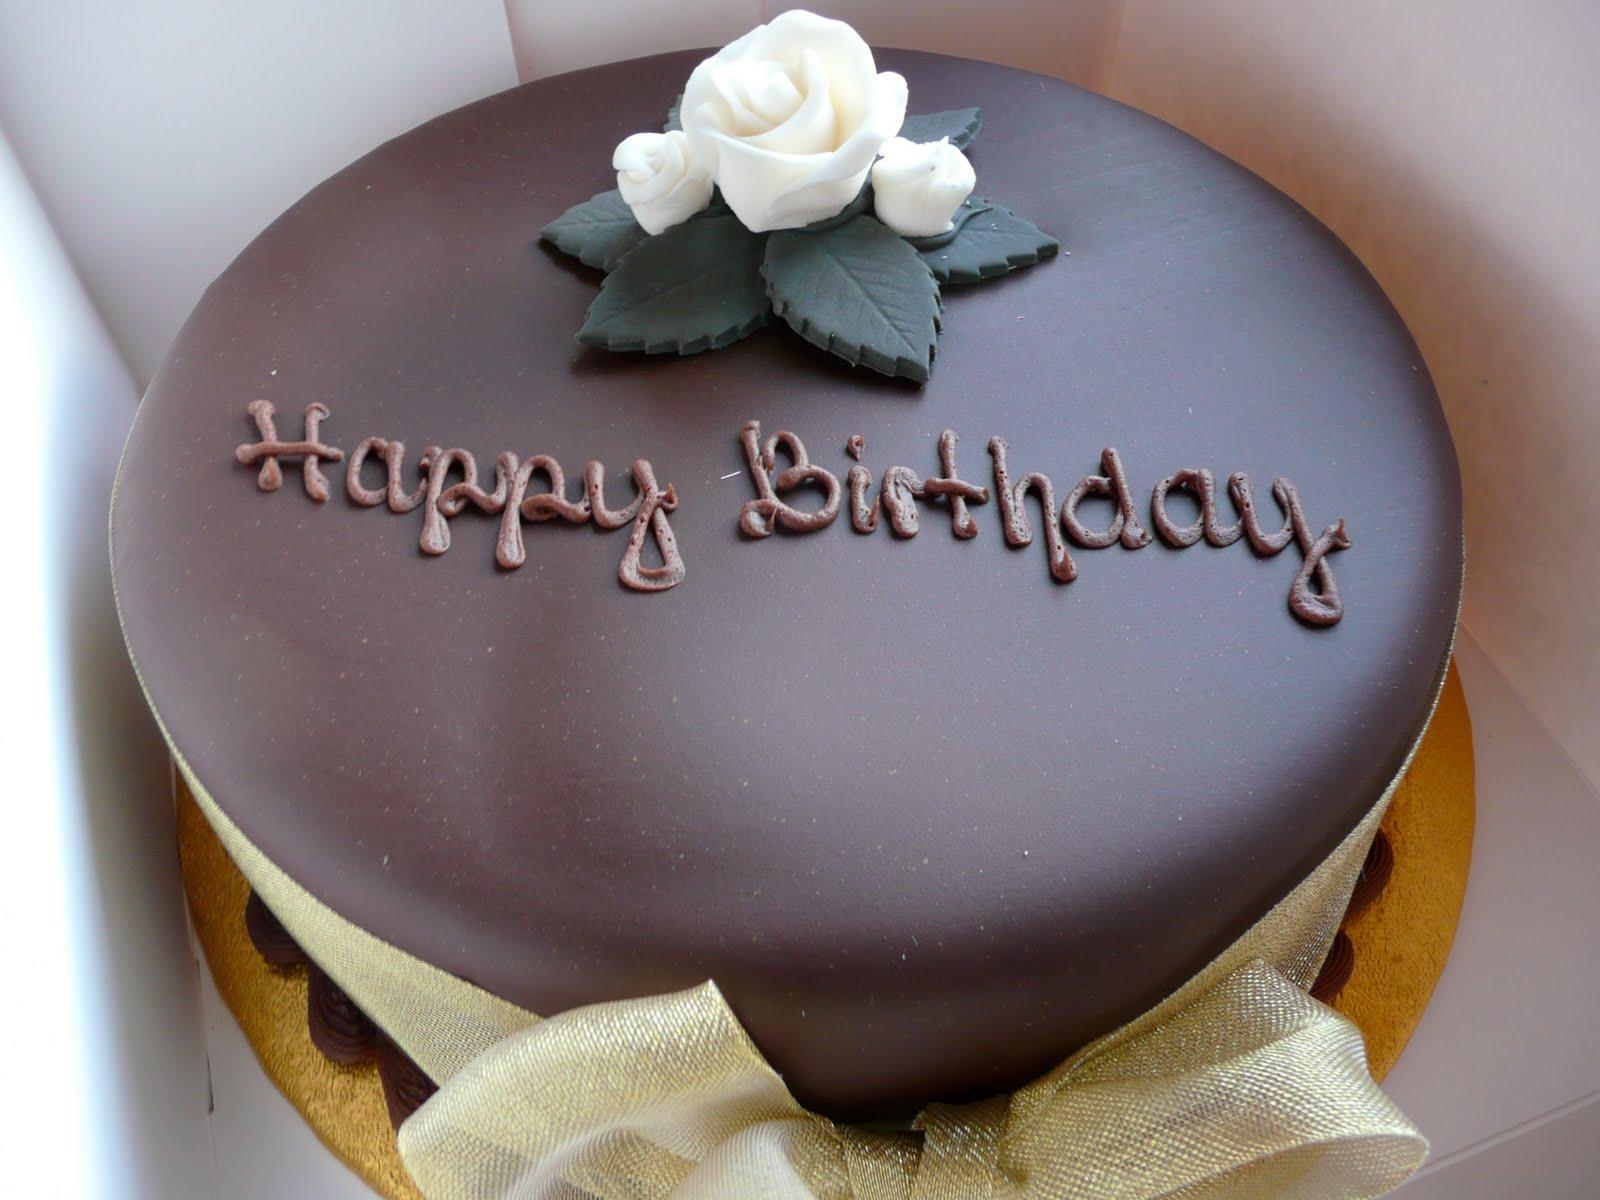 Happy Birthday Wishes - Happy Birthday Wishes - Wallpapers, hd-wallpapers, HD, Free, Birthday, 4k-wallpapers, 4k